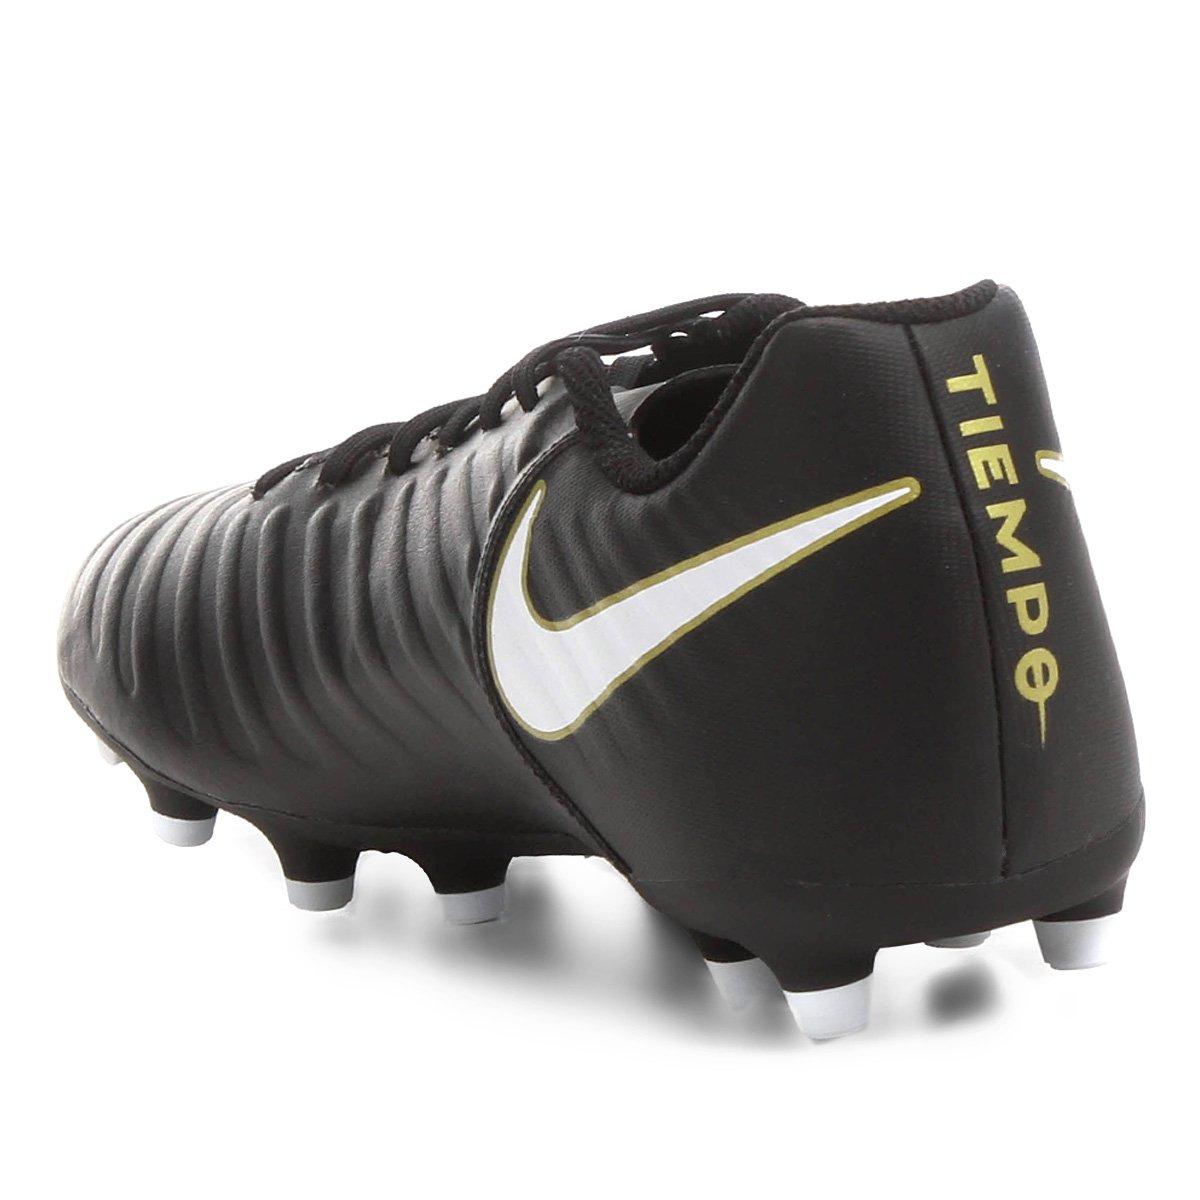 00a705e031 Chuteira Campo Nike Tiempo Rio 4 FG - Preto e Branco - Compre Agora ...